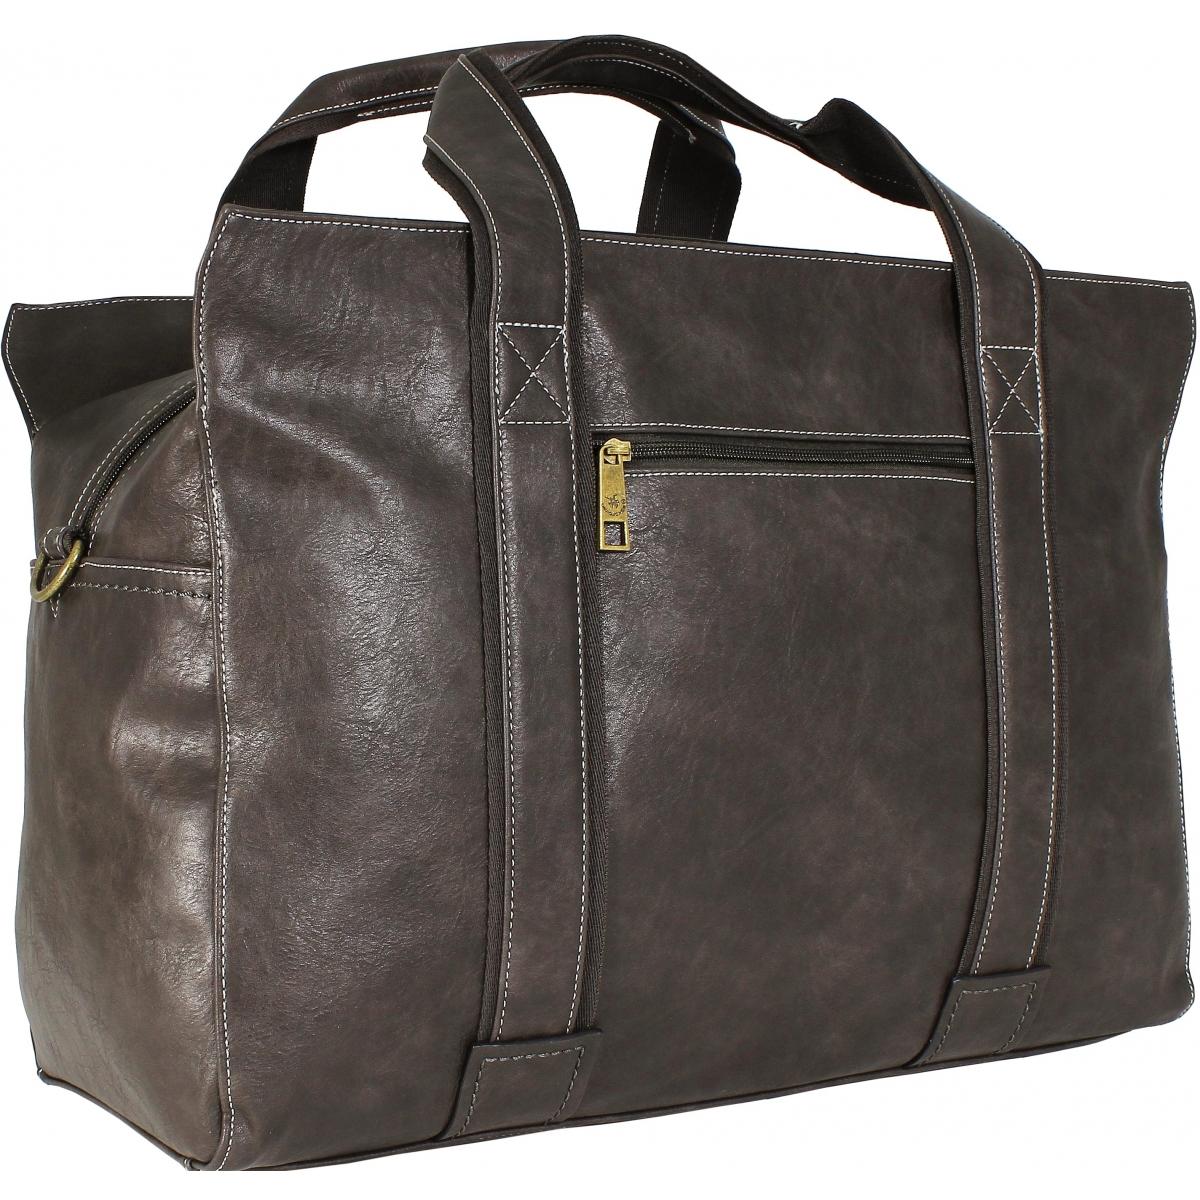 sac de voyage 48h david jones djcm20801a couleur principale d grey. Black Bedroom Furniture Sets. Home Design Ideas